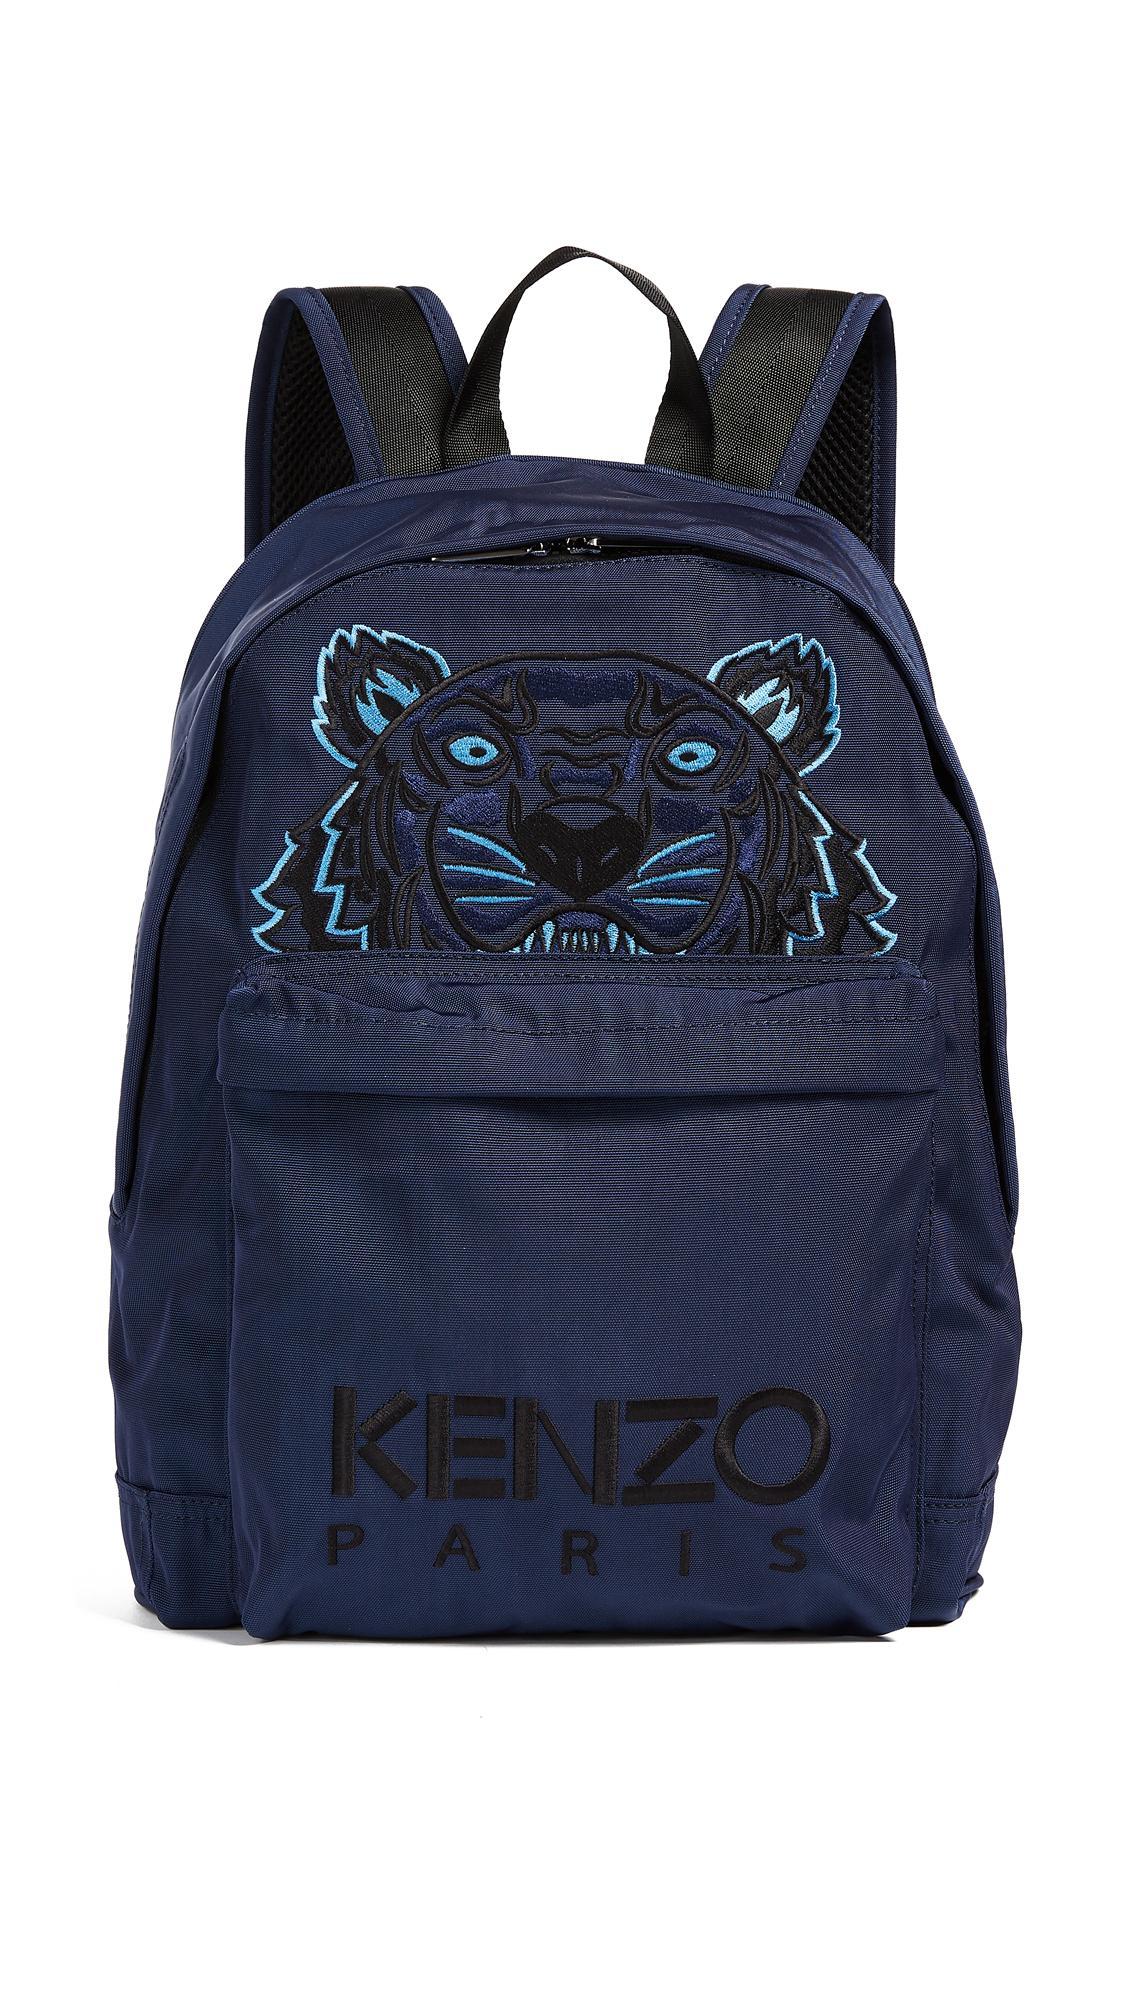 Kenzo Kanvas Tiger Backpack In Navy